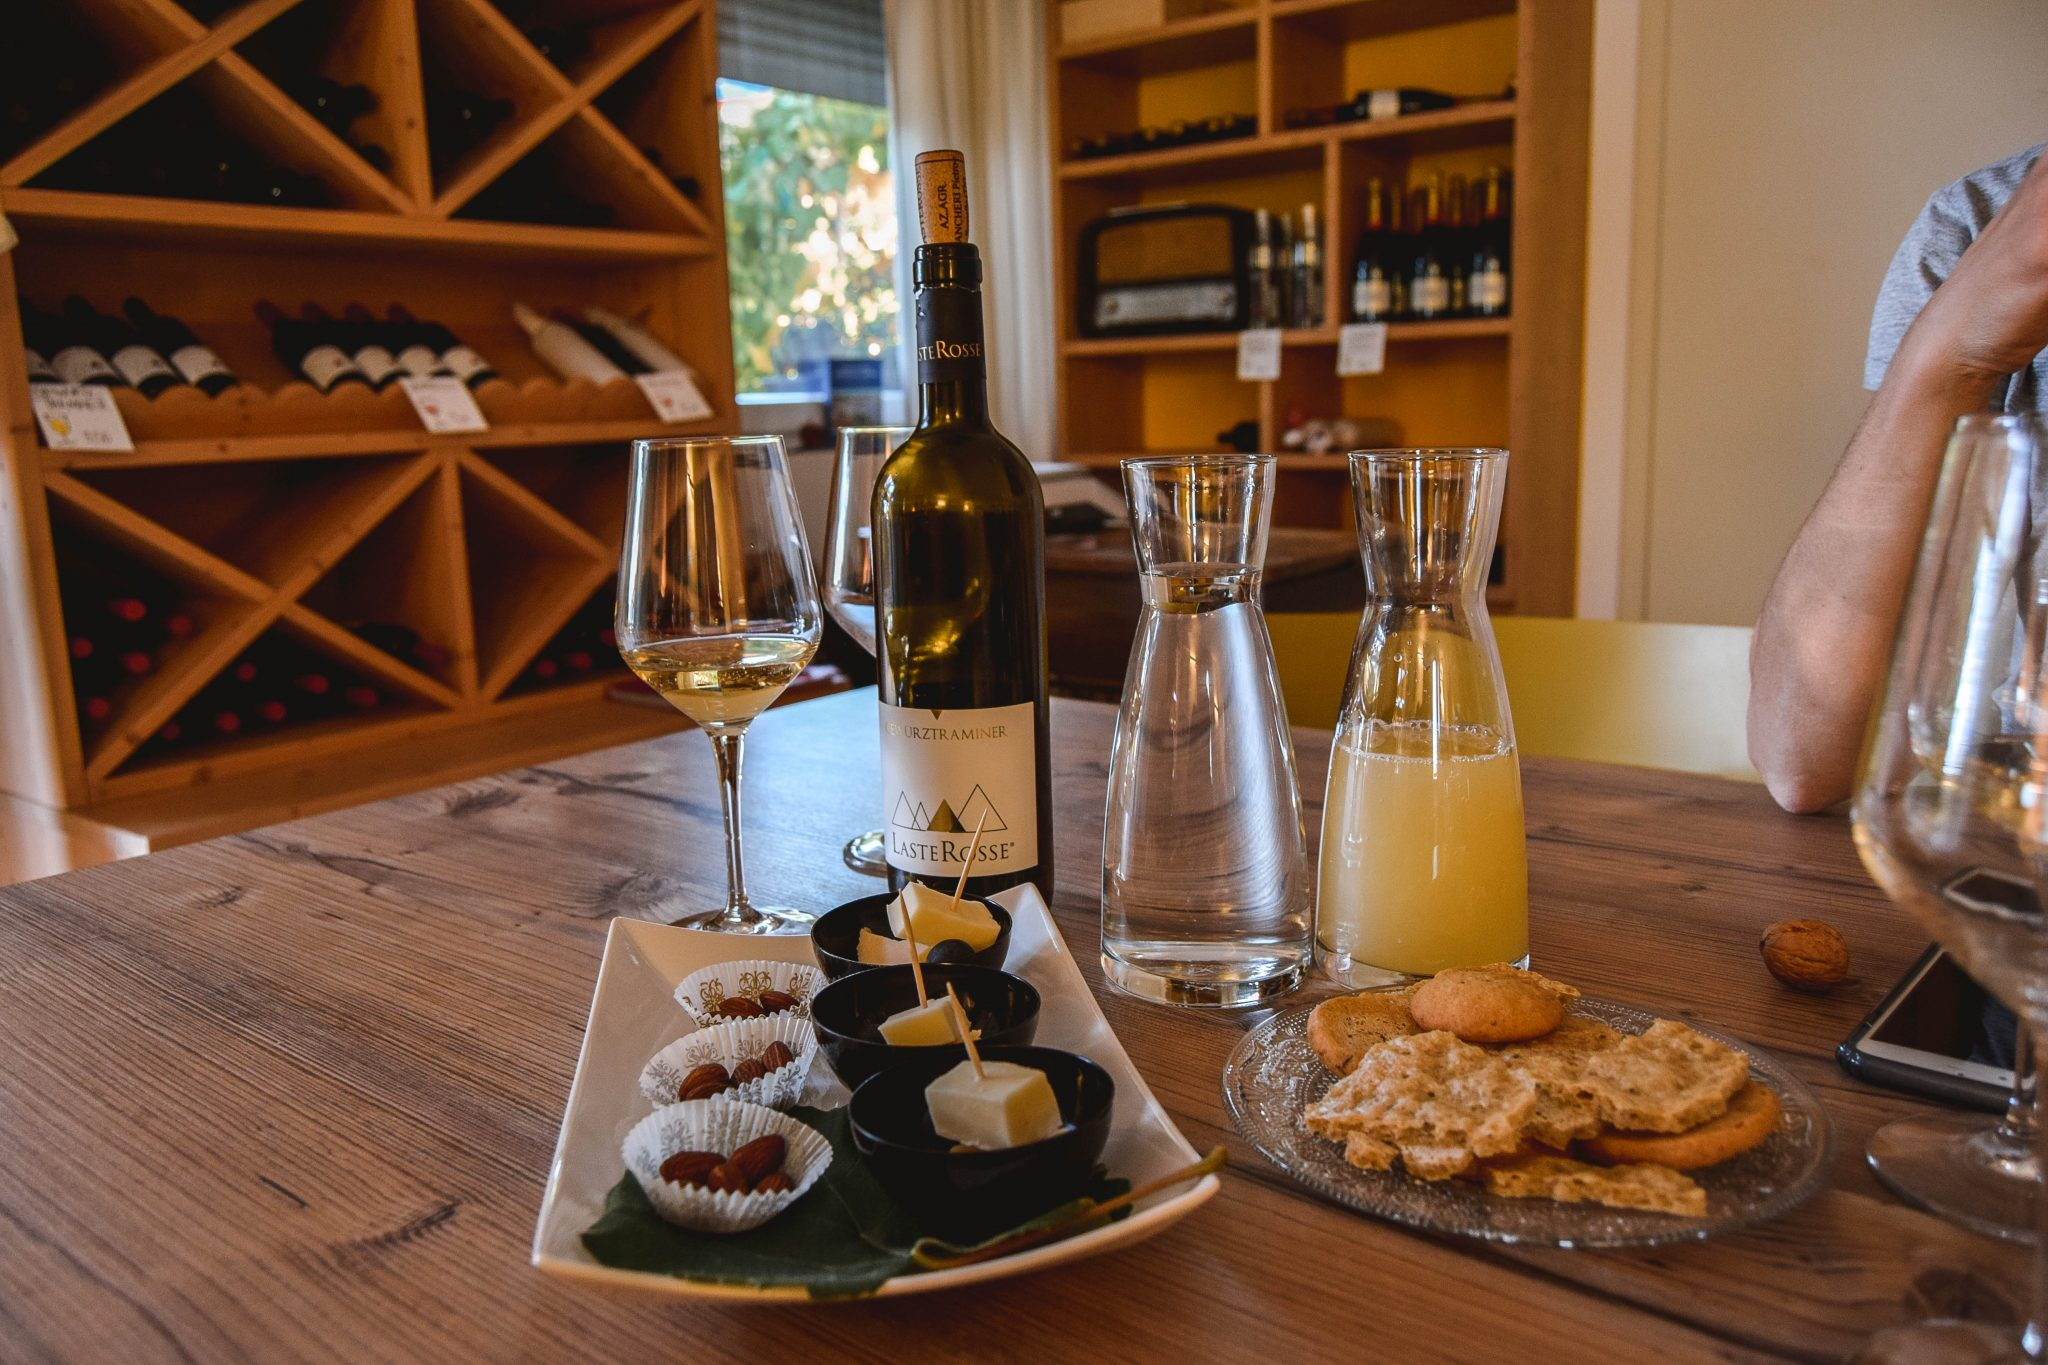 Wanderers & Warriors - Things To Do In Val Di Non Trentino - Wine tasting Trentino